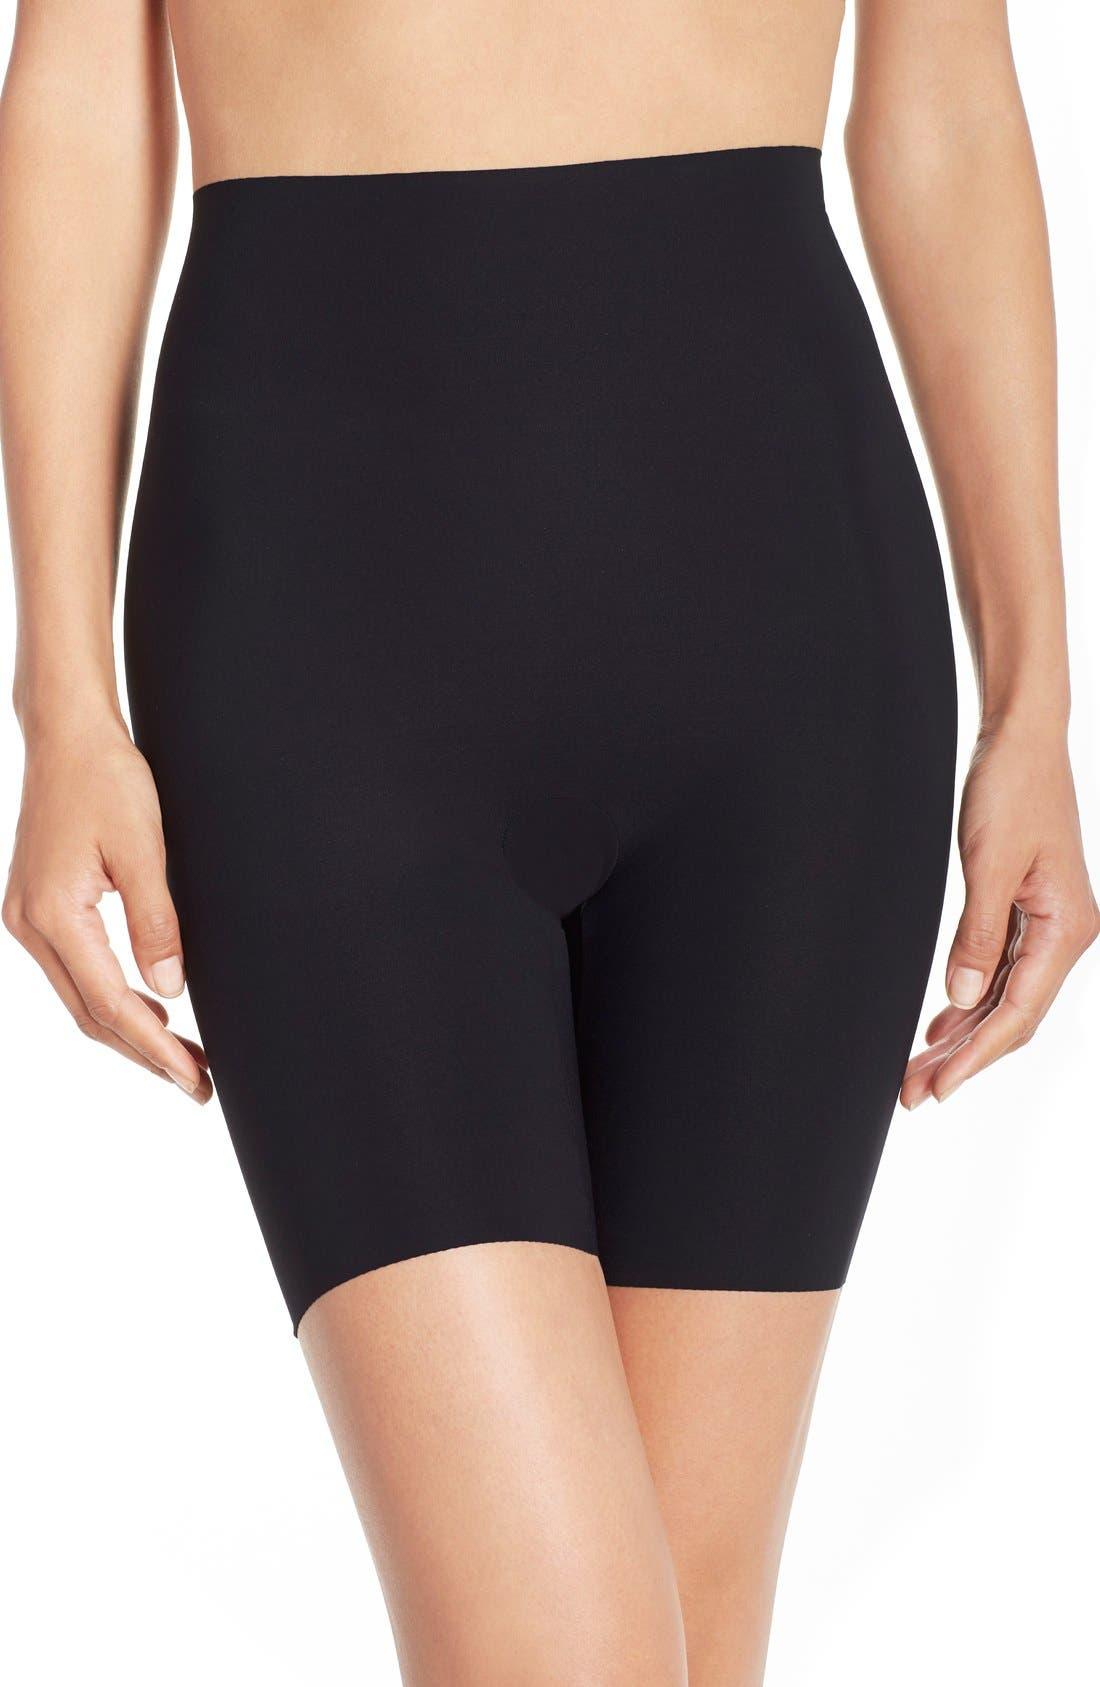 COMMANDO 'Control' High Waist Shaping Shorts, Main, color, BLACK